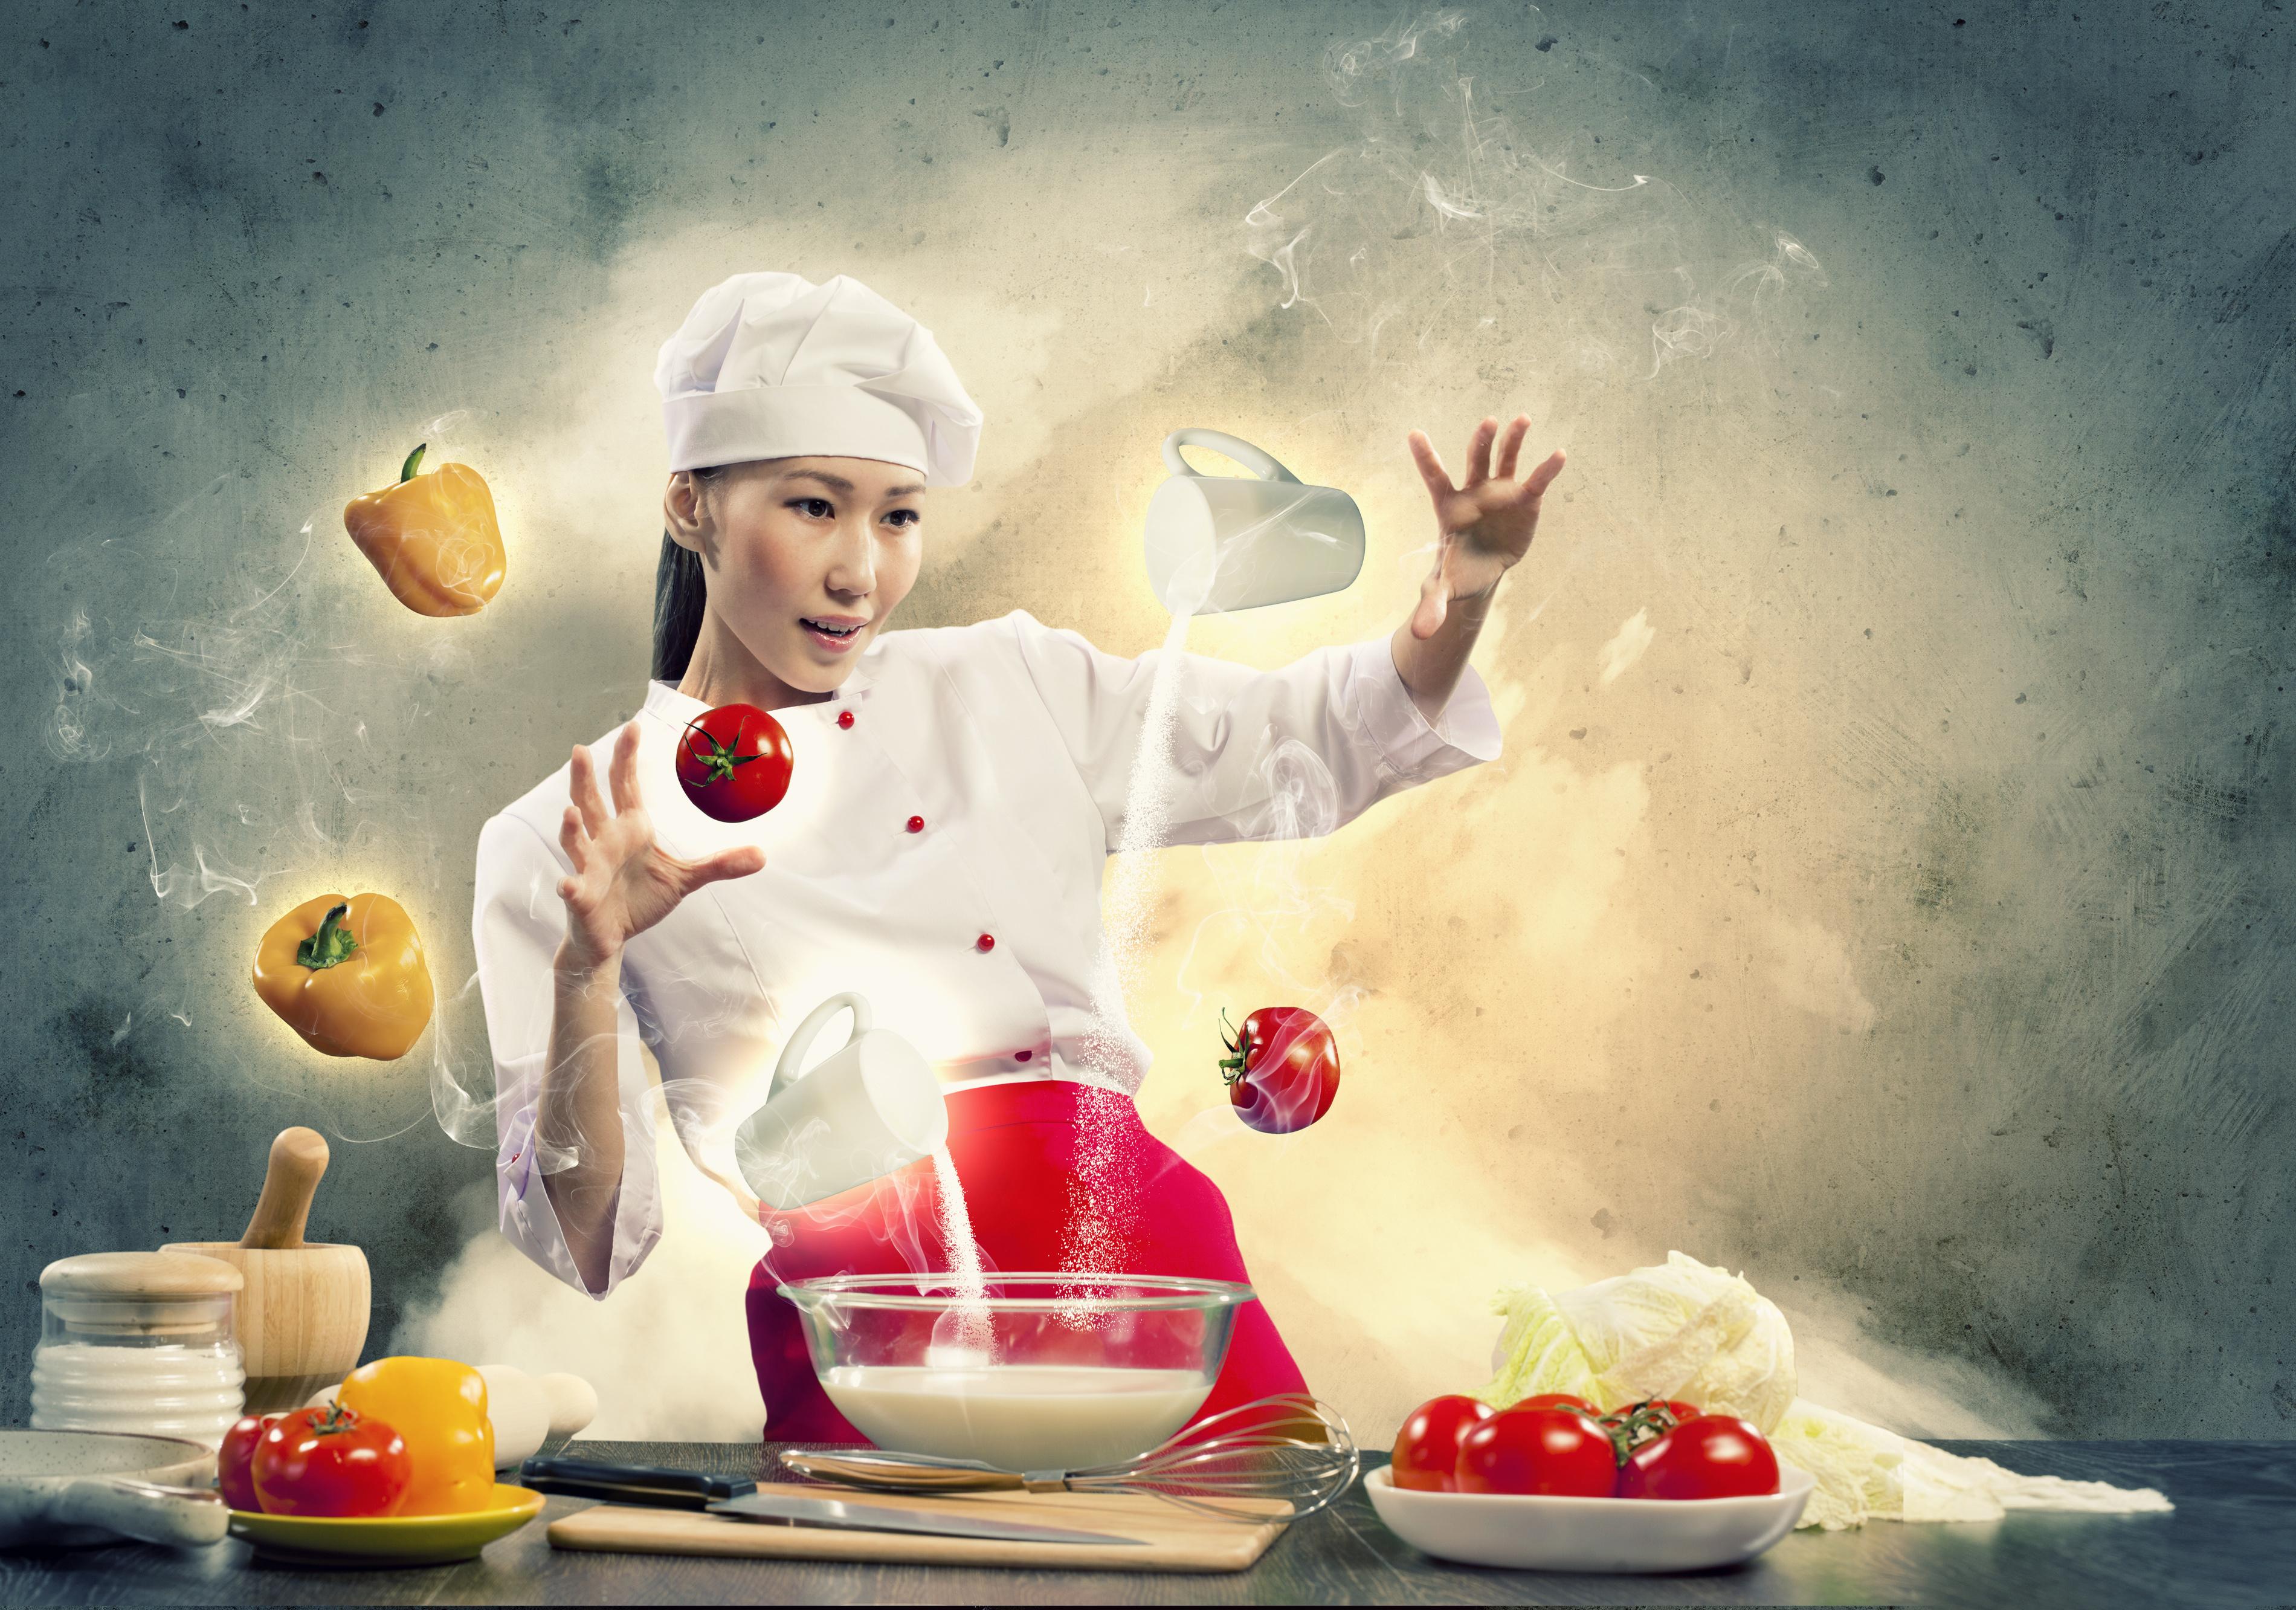 Про кулинарию картинки